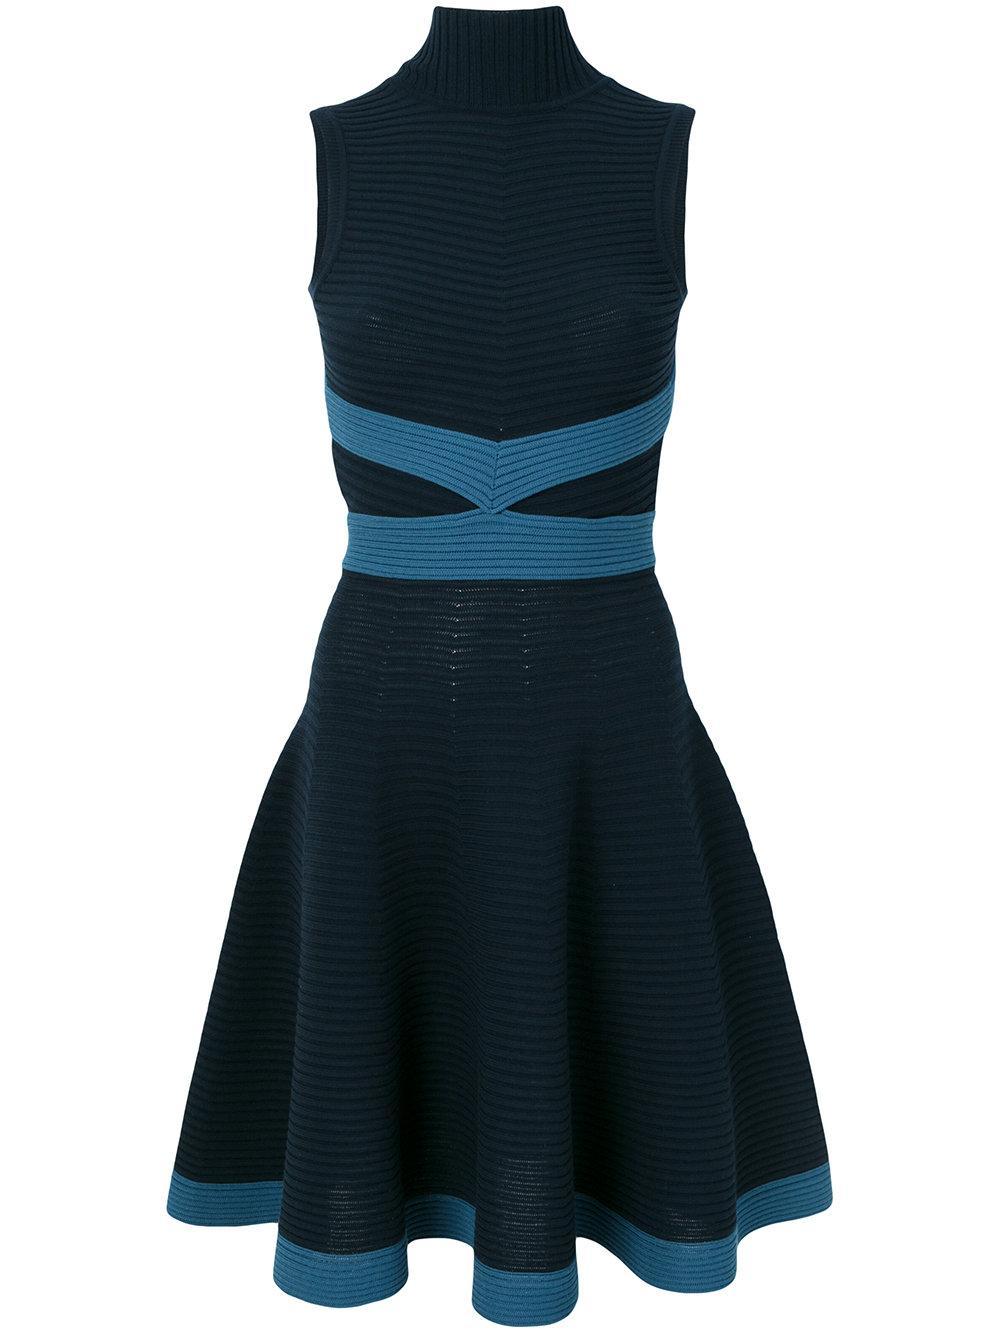 Fendi Ribbed Sleeveless Dress